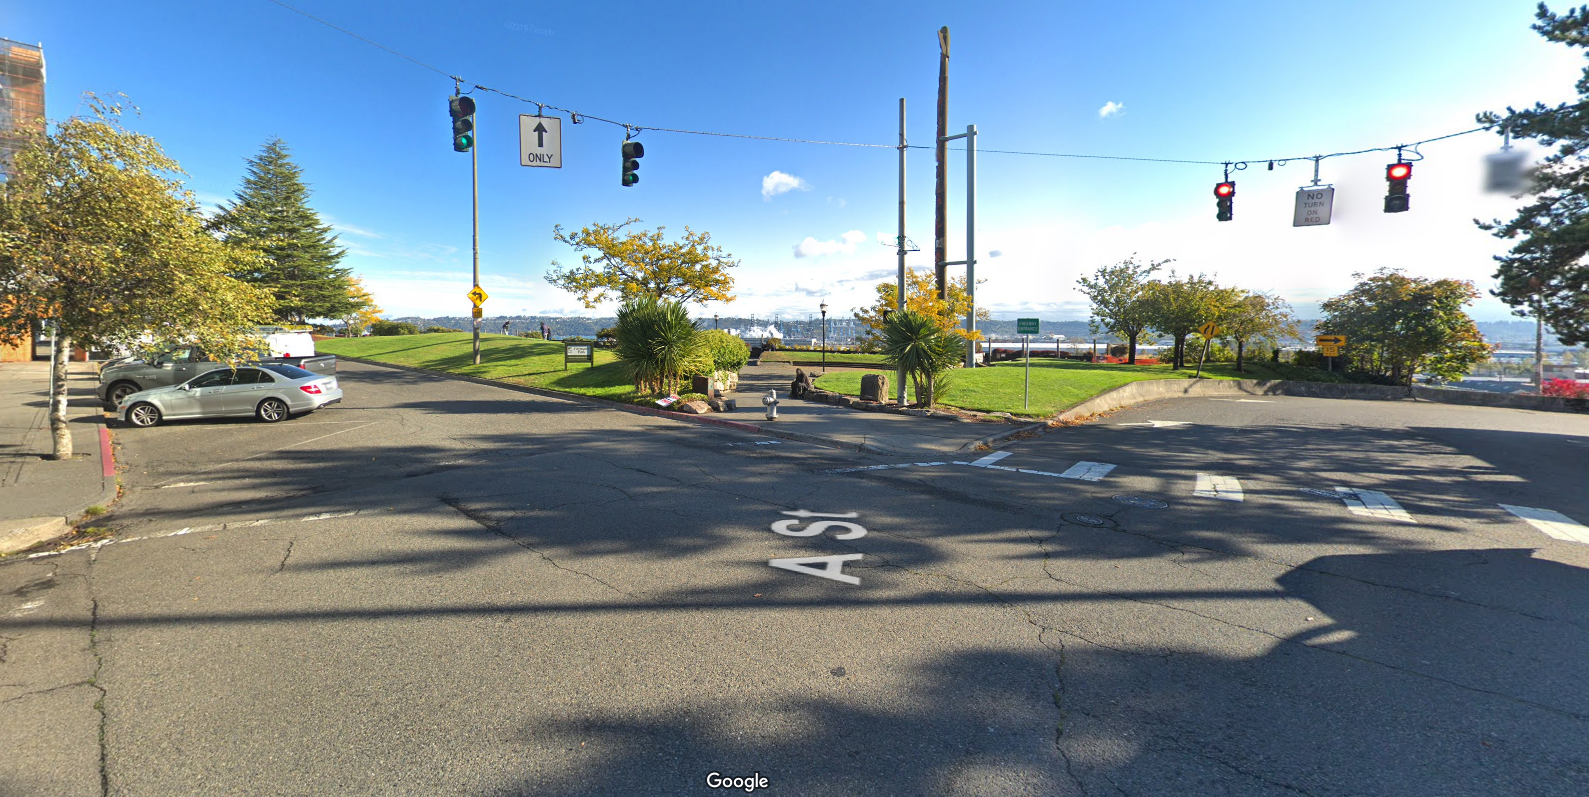 Fireman's Park_Google Streetview_2018